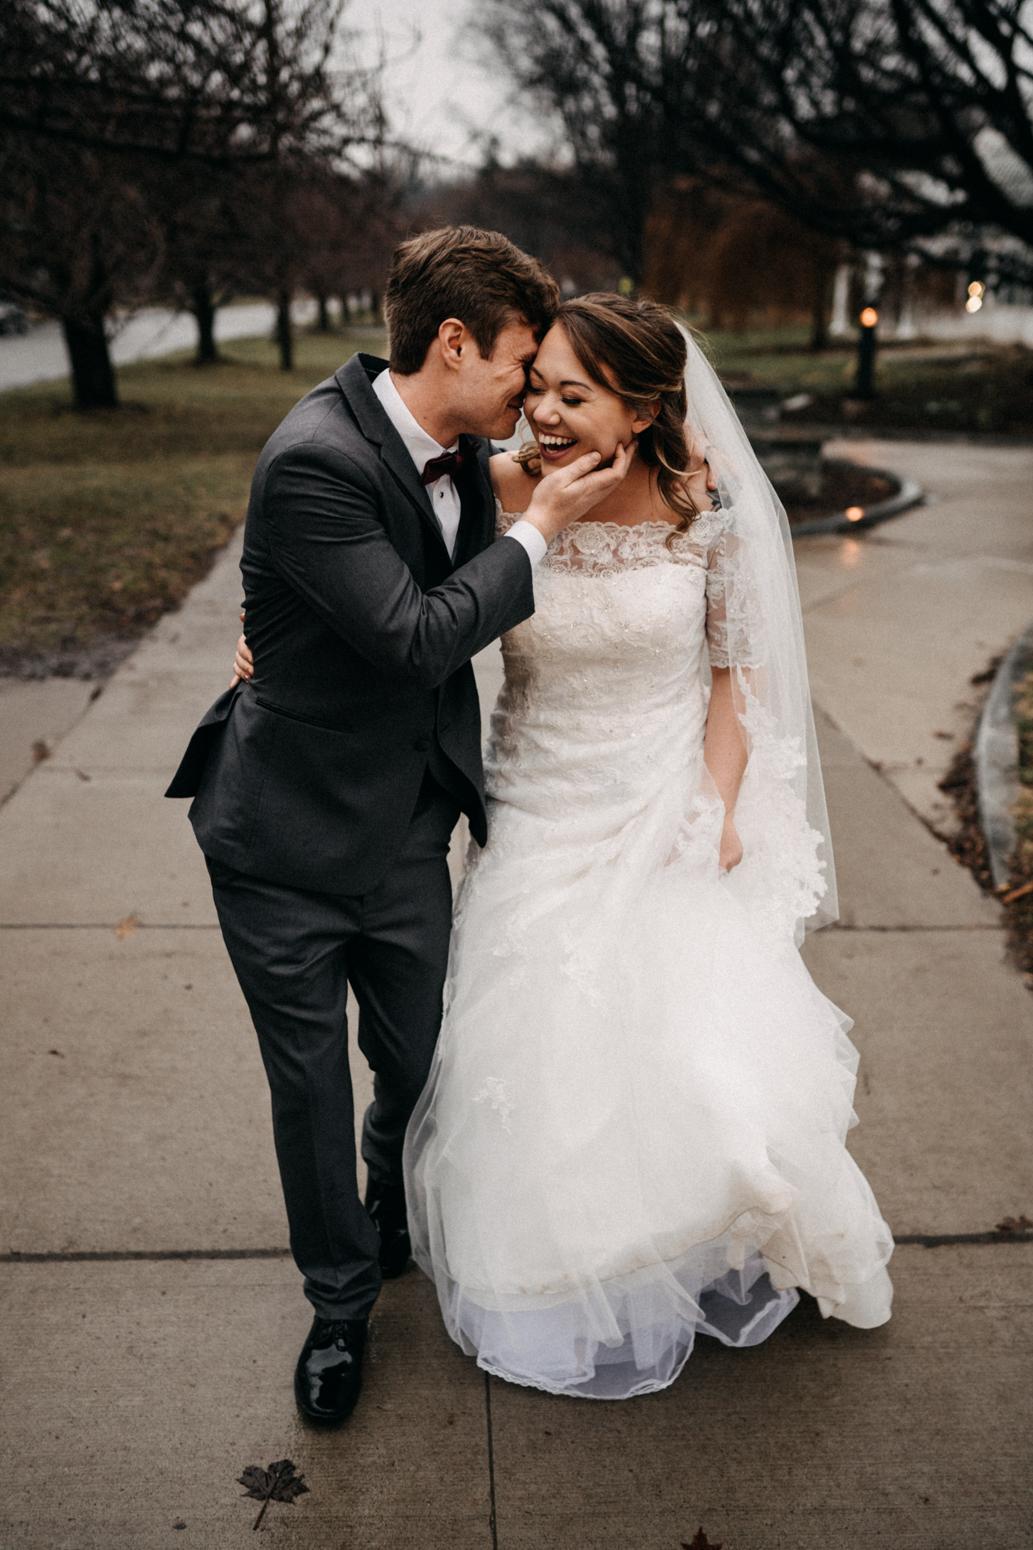 Rochester, NY Wedding Photographer (89 of 96).JPG